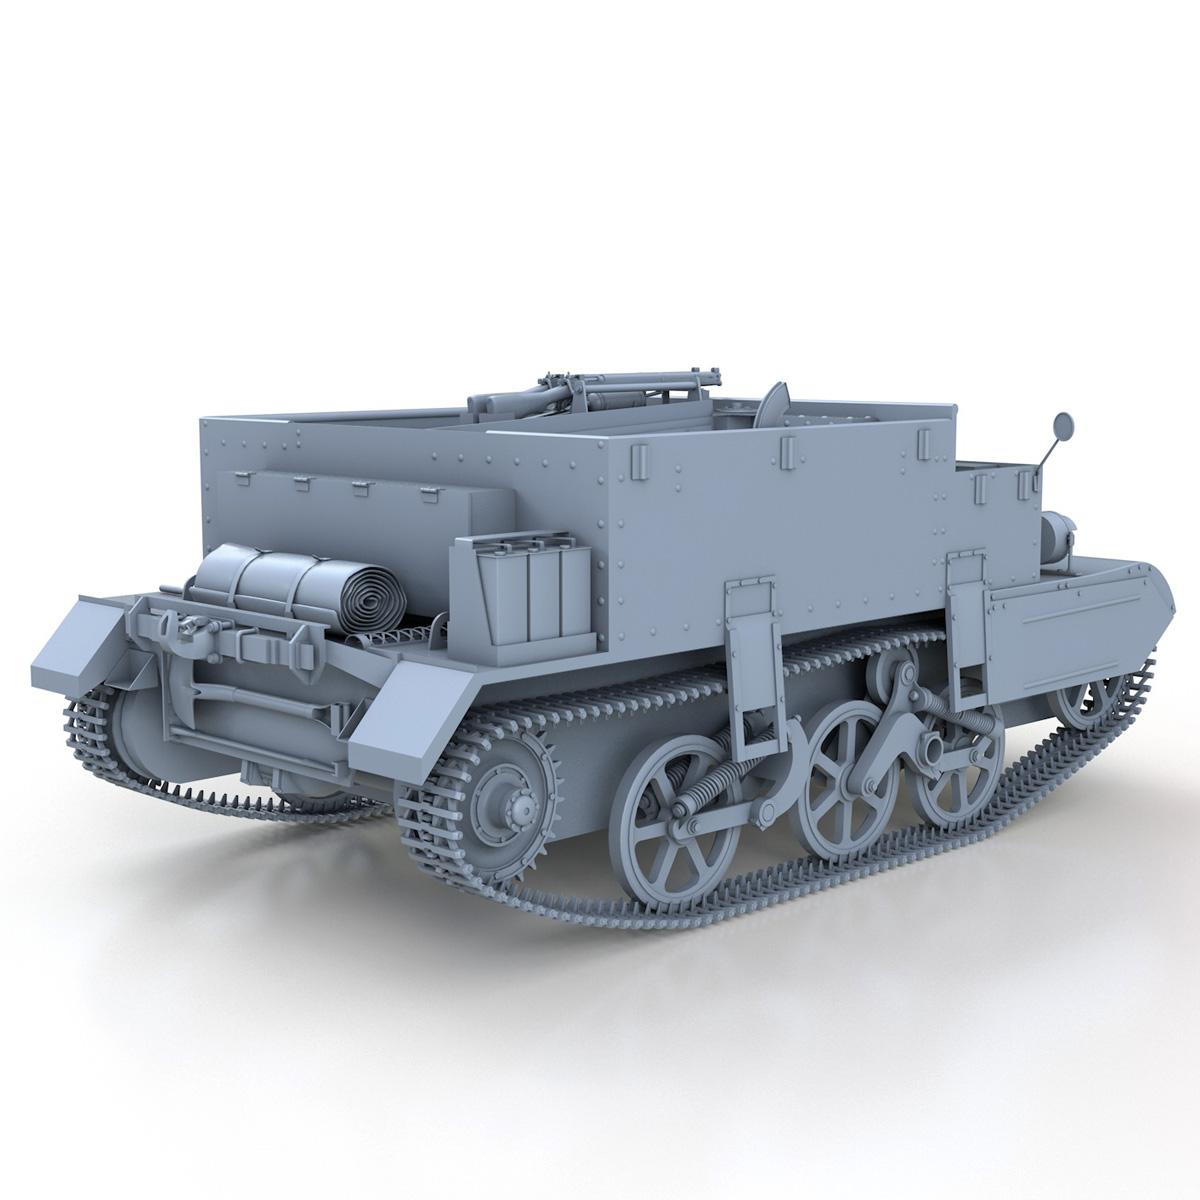 Universal Carrier MK II - Bren Gun Carrier 3d model 3ds fbx c4d lwo lws lw obj 272963